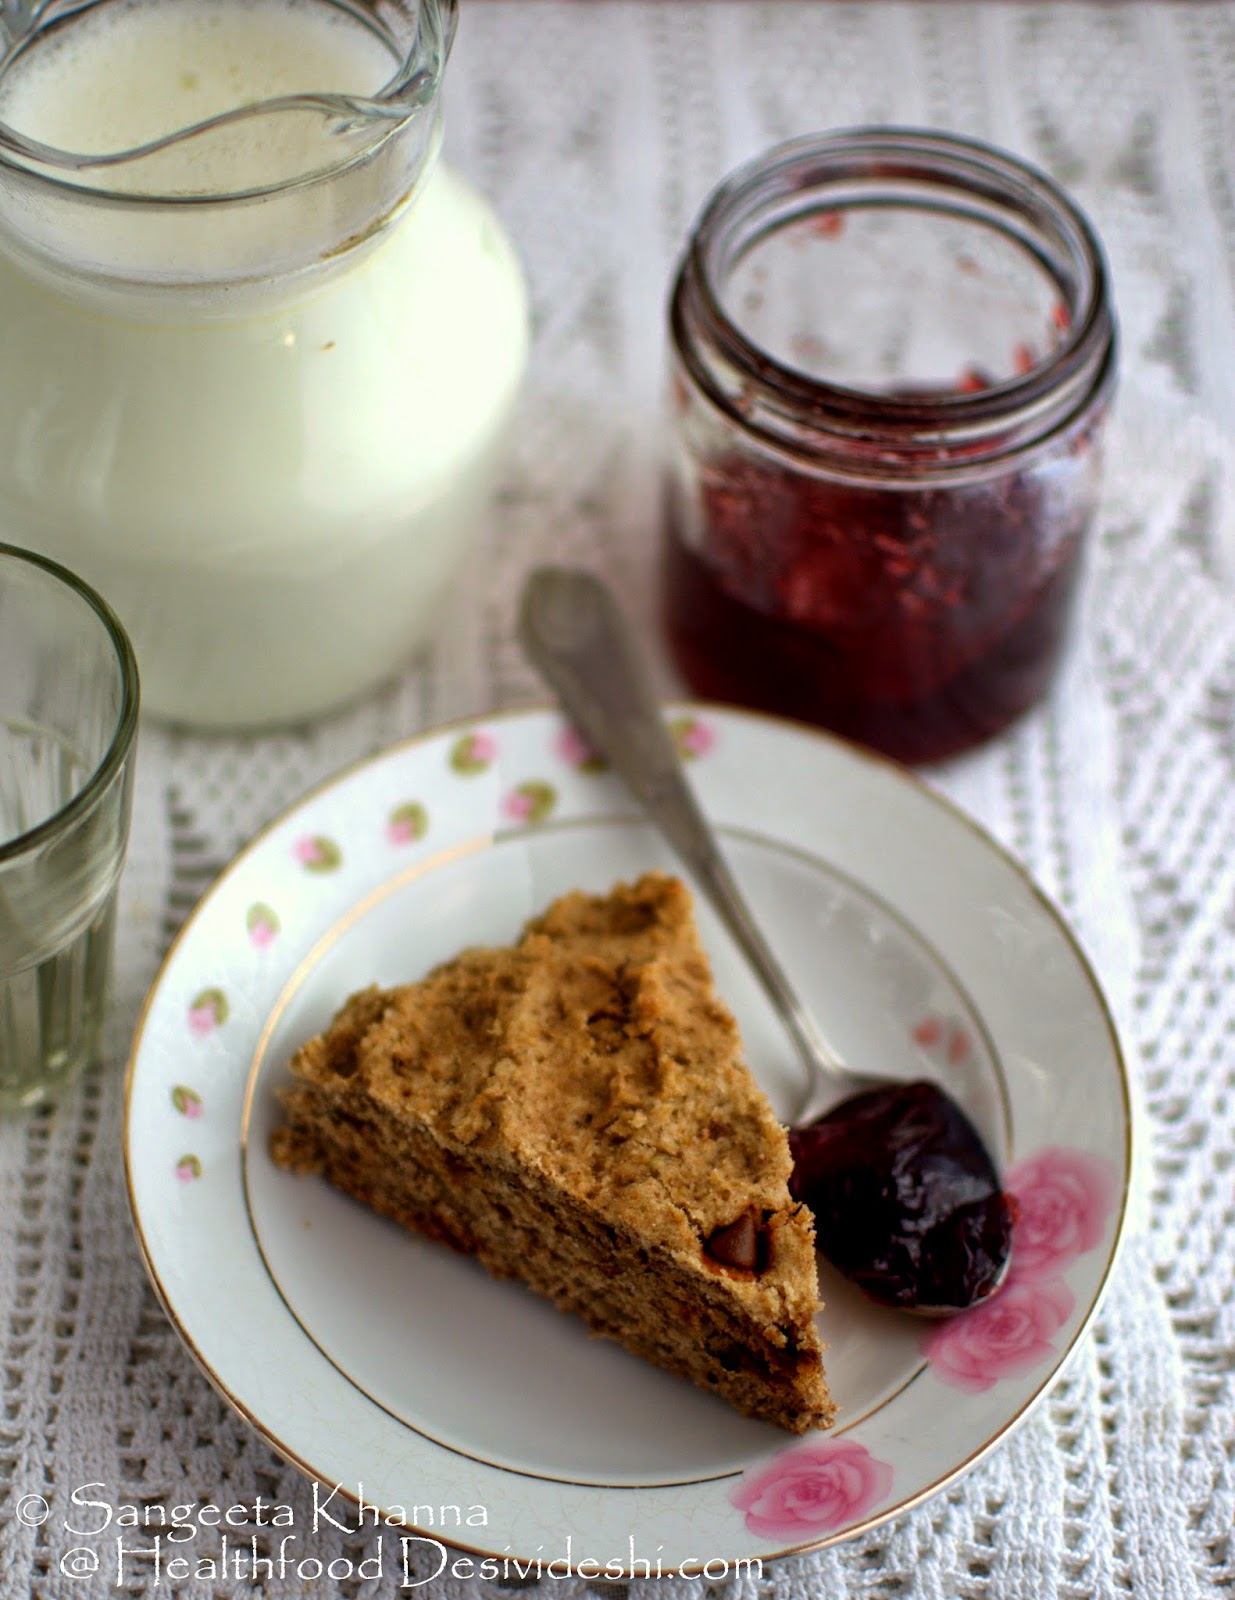 101 gluten free breakfasts | buckwheat banana scones (egg-less) with cinnamon chocolate chips